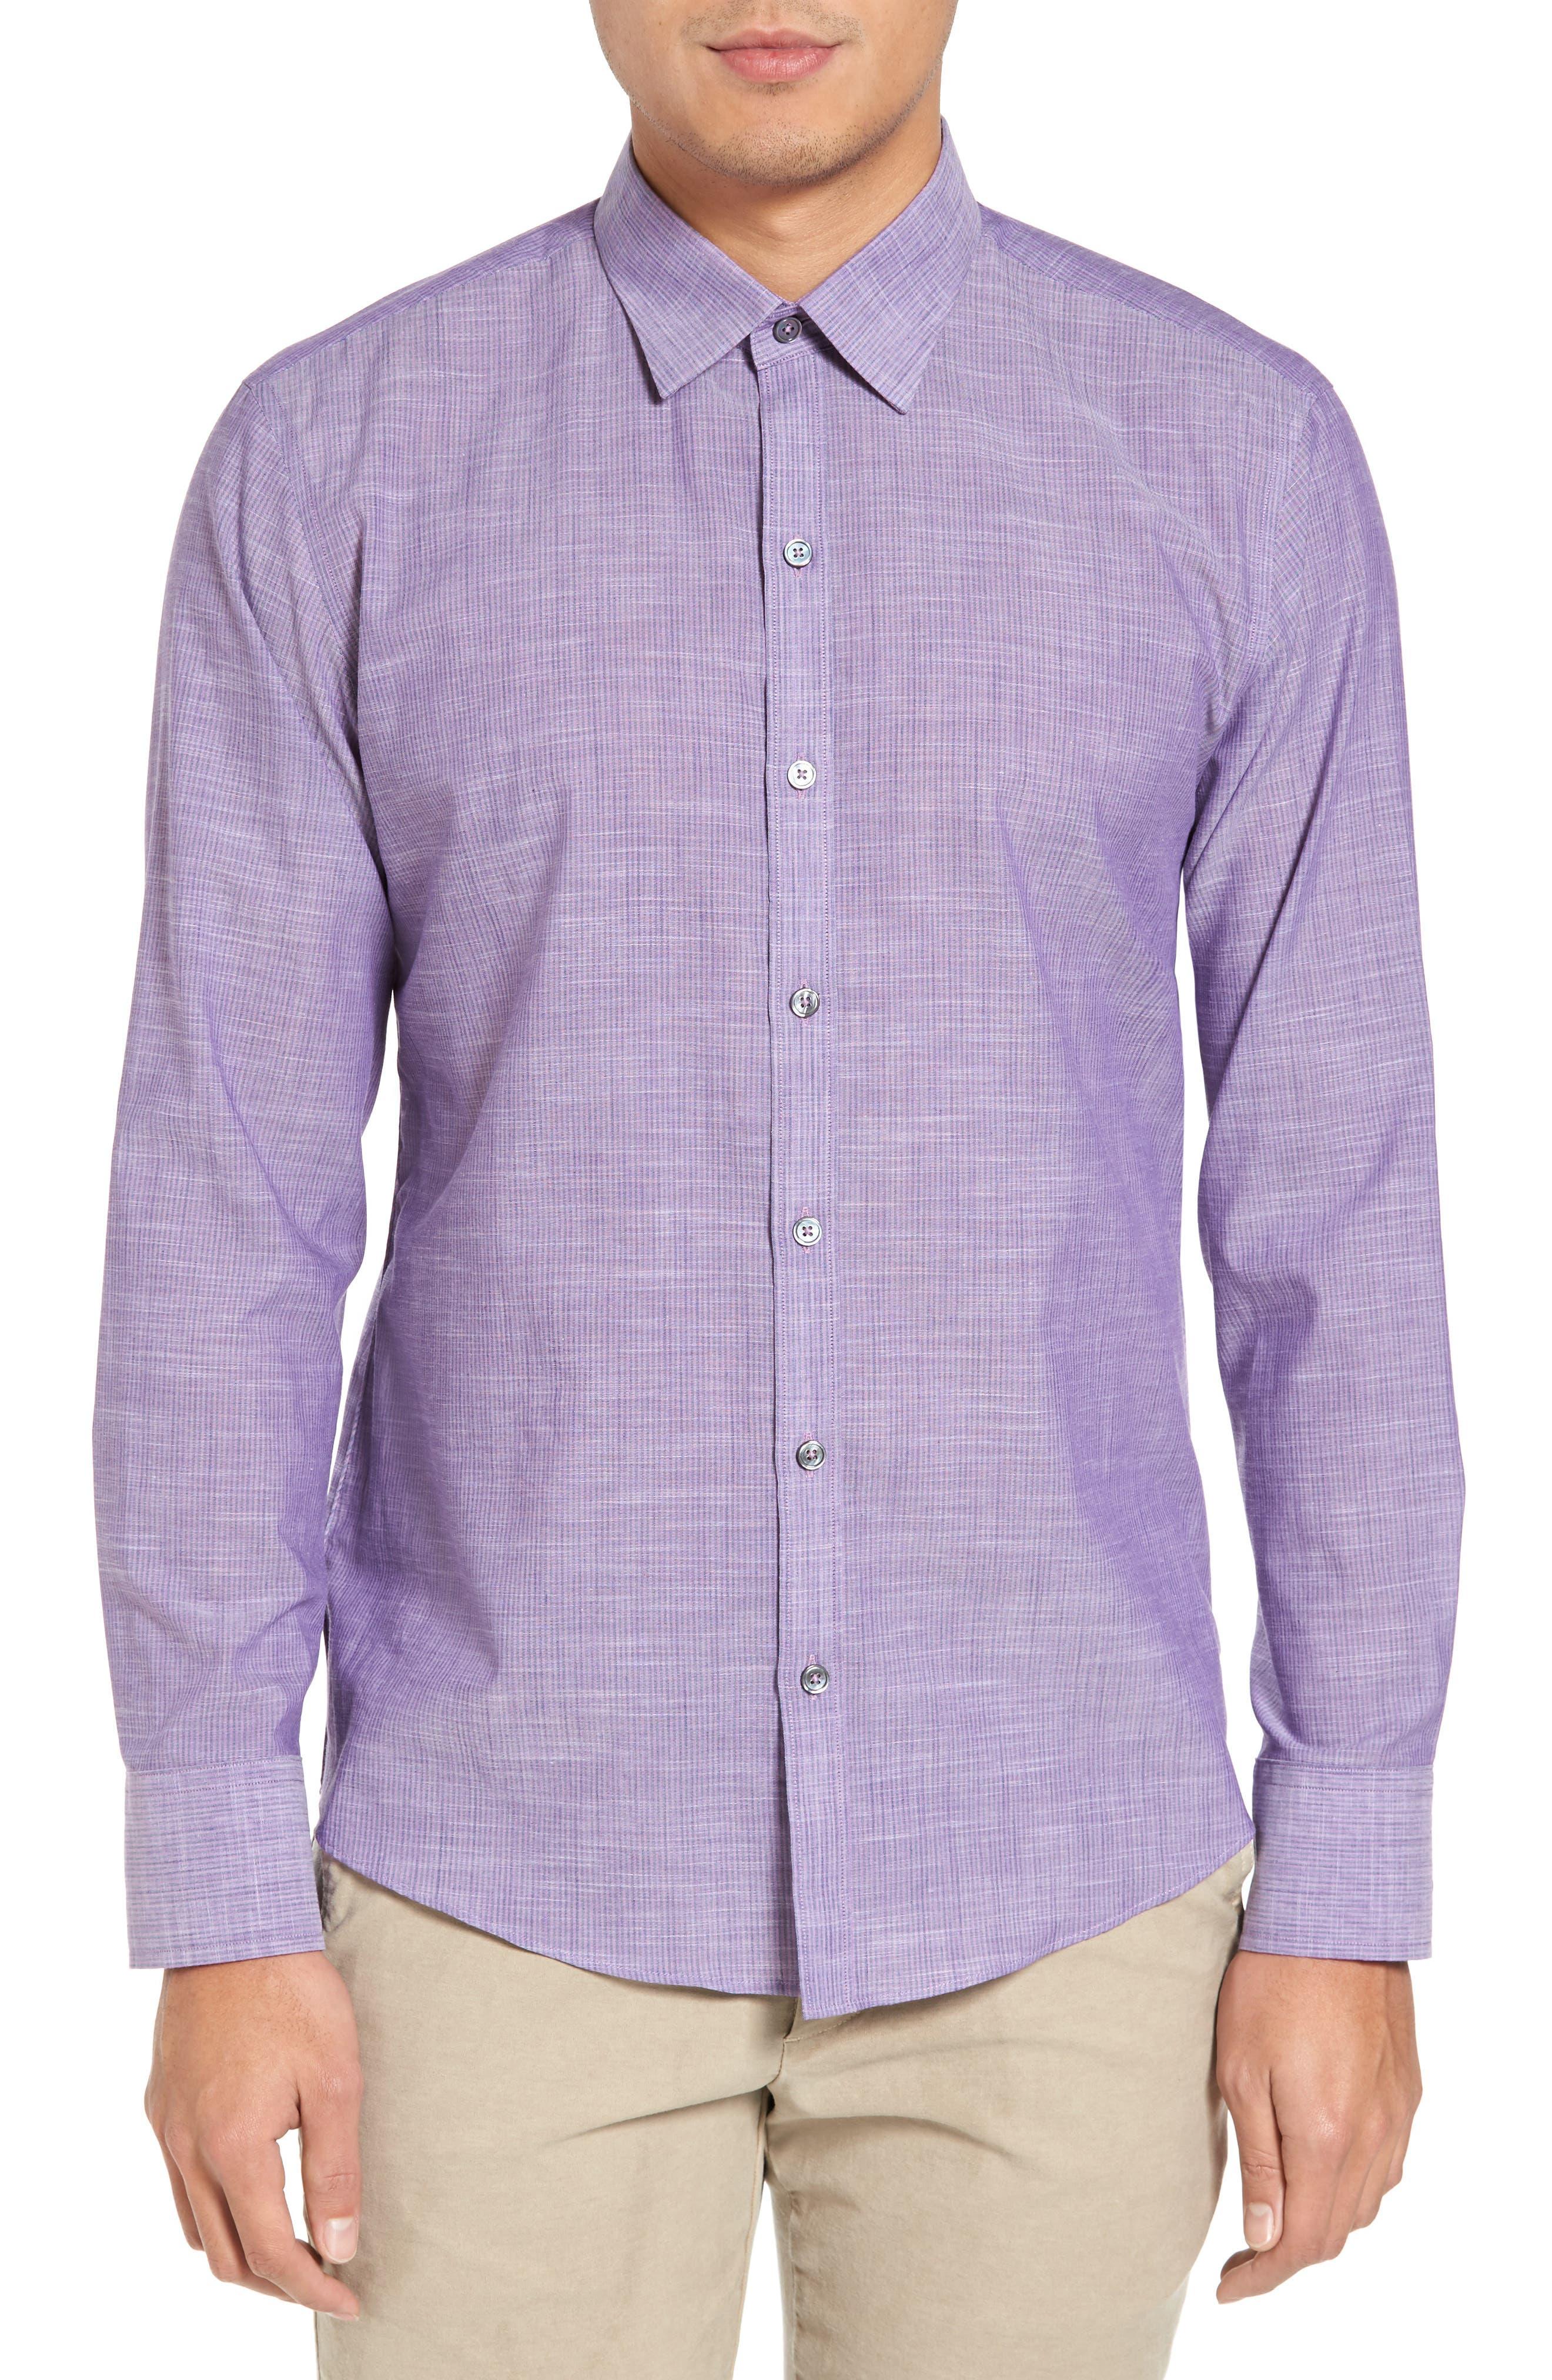 Snower Slim Fit Sport Shirt,                         Main,                         color, 500